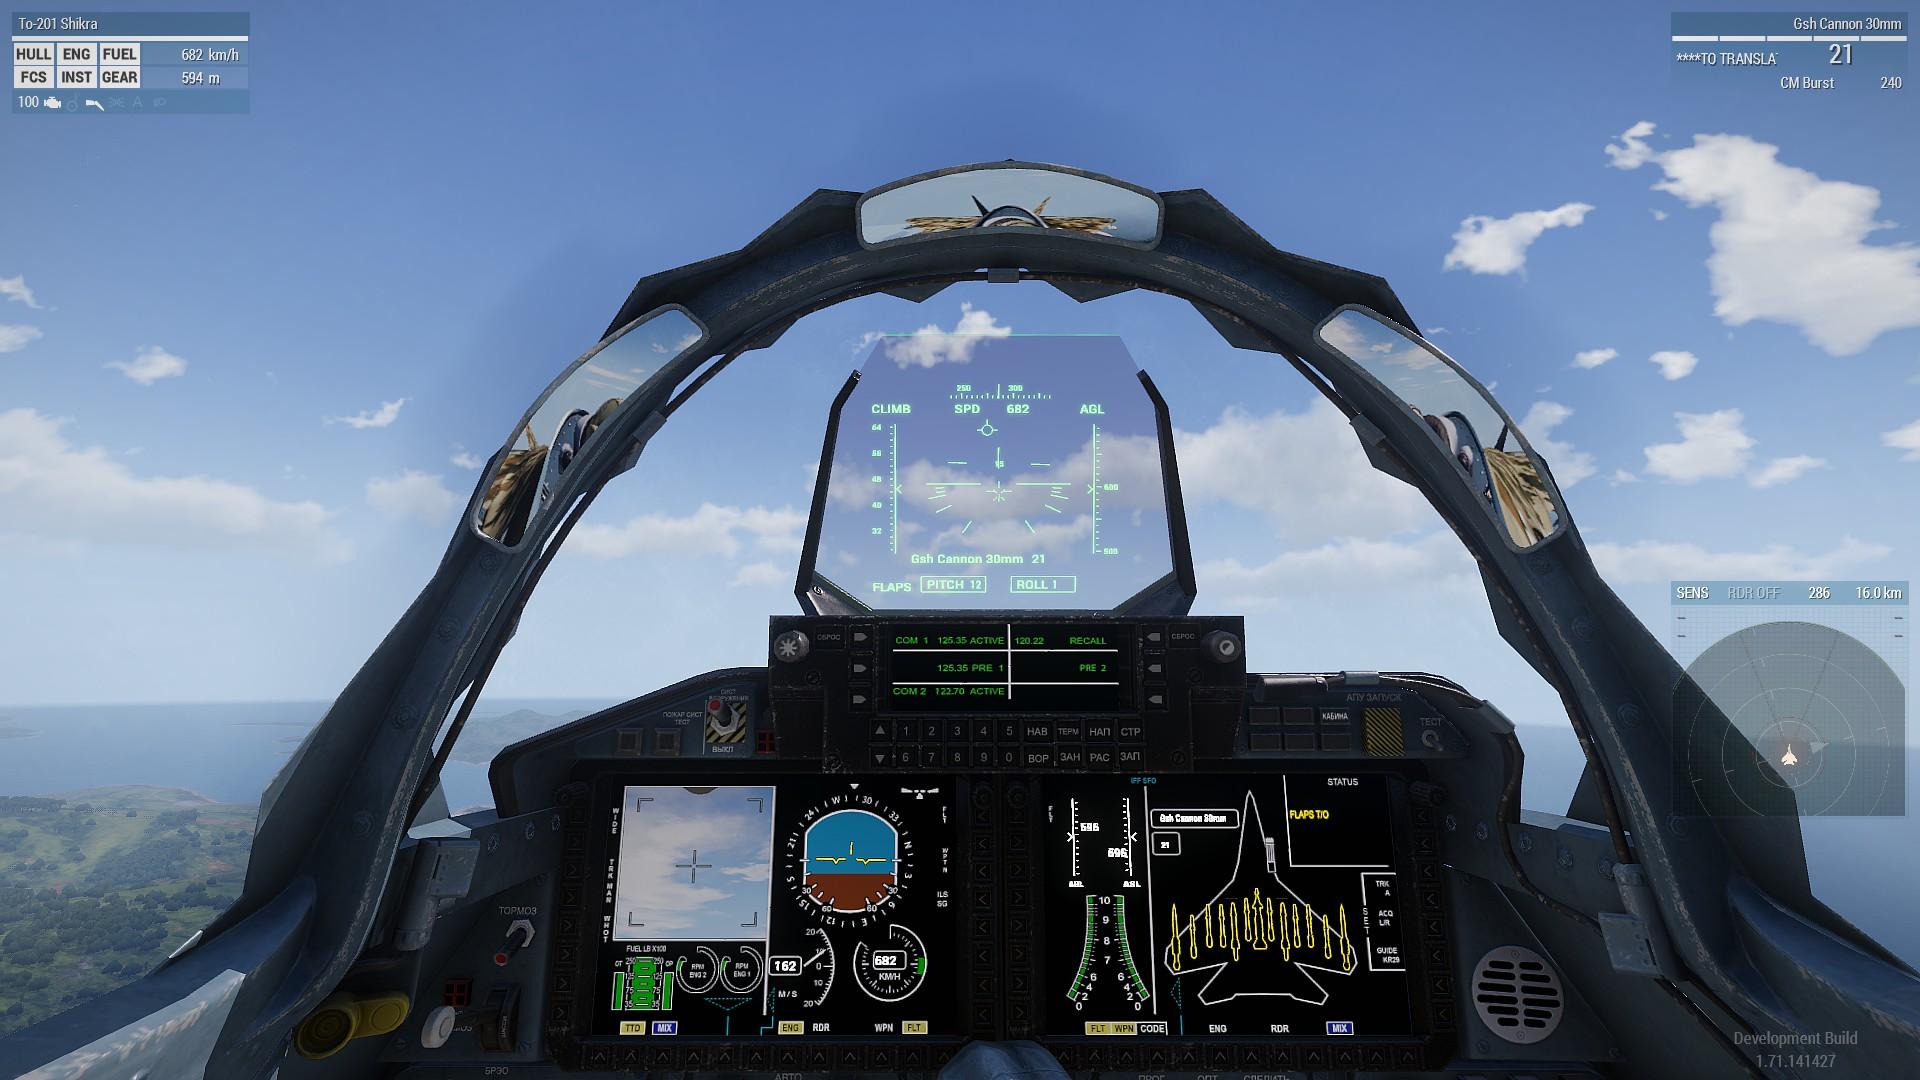 ⚓ T124569 Jets - To-201 Shikra pilot orientation incorrect